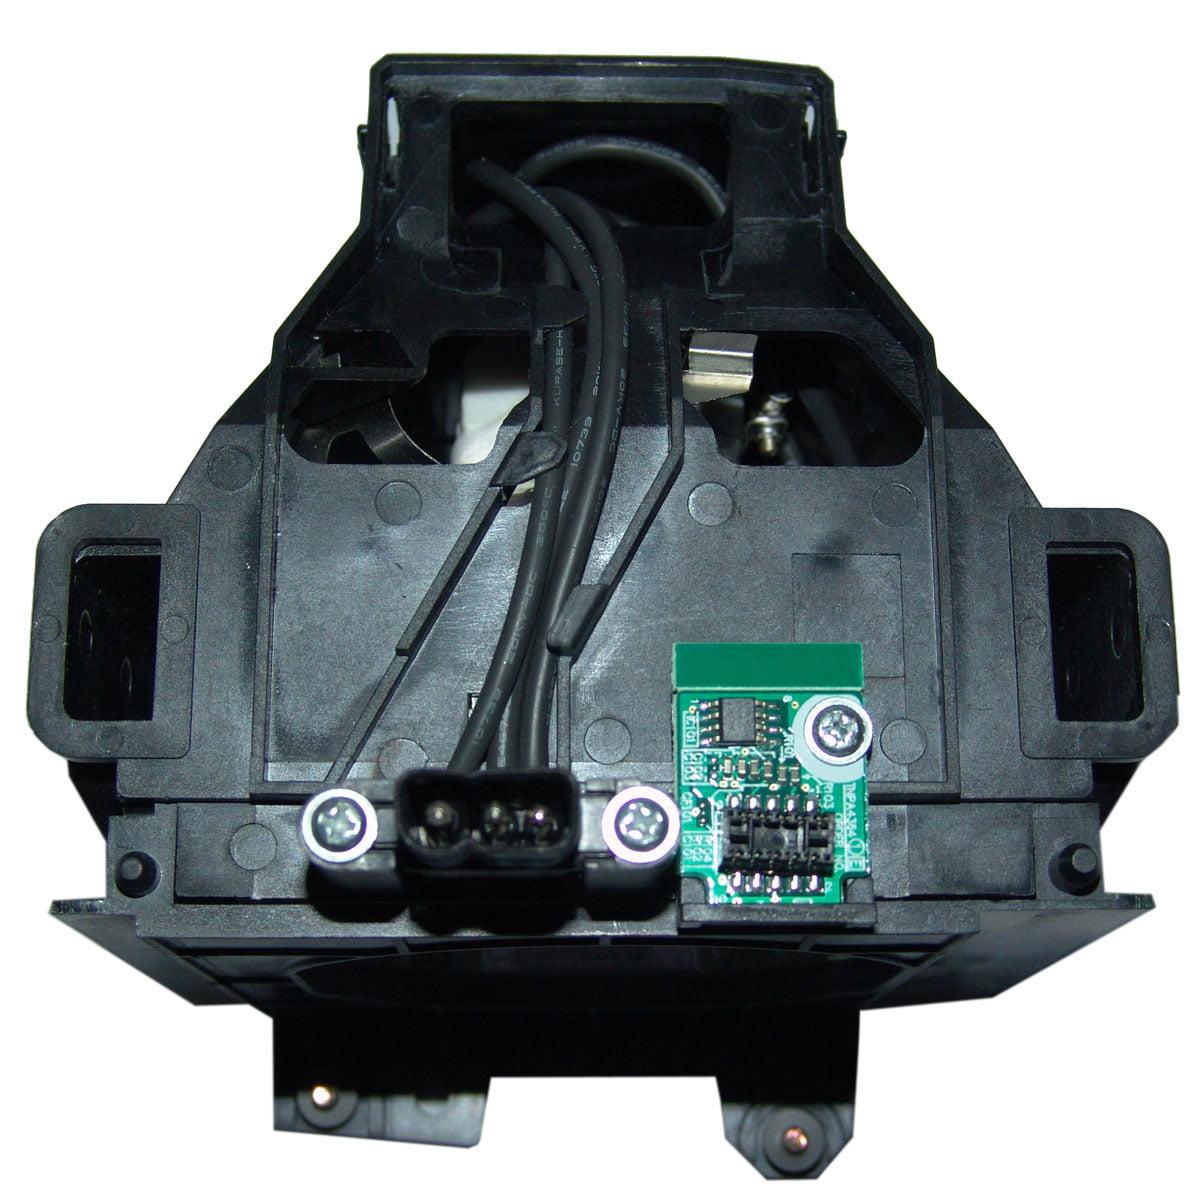 Lamp Only Single Lamp Lutema Platinum Bulb for Panasonic PT-DW5100UL Projector